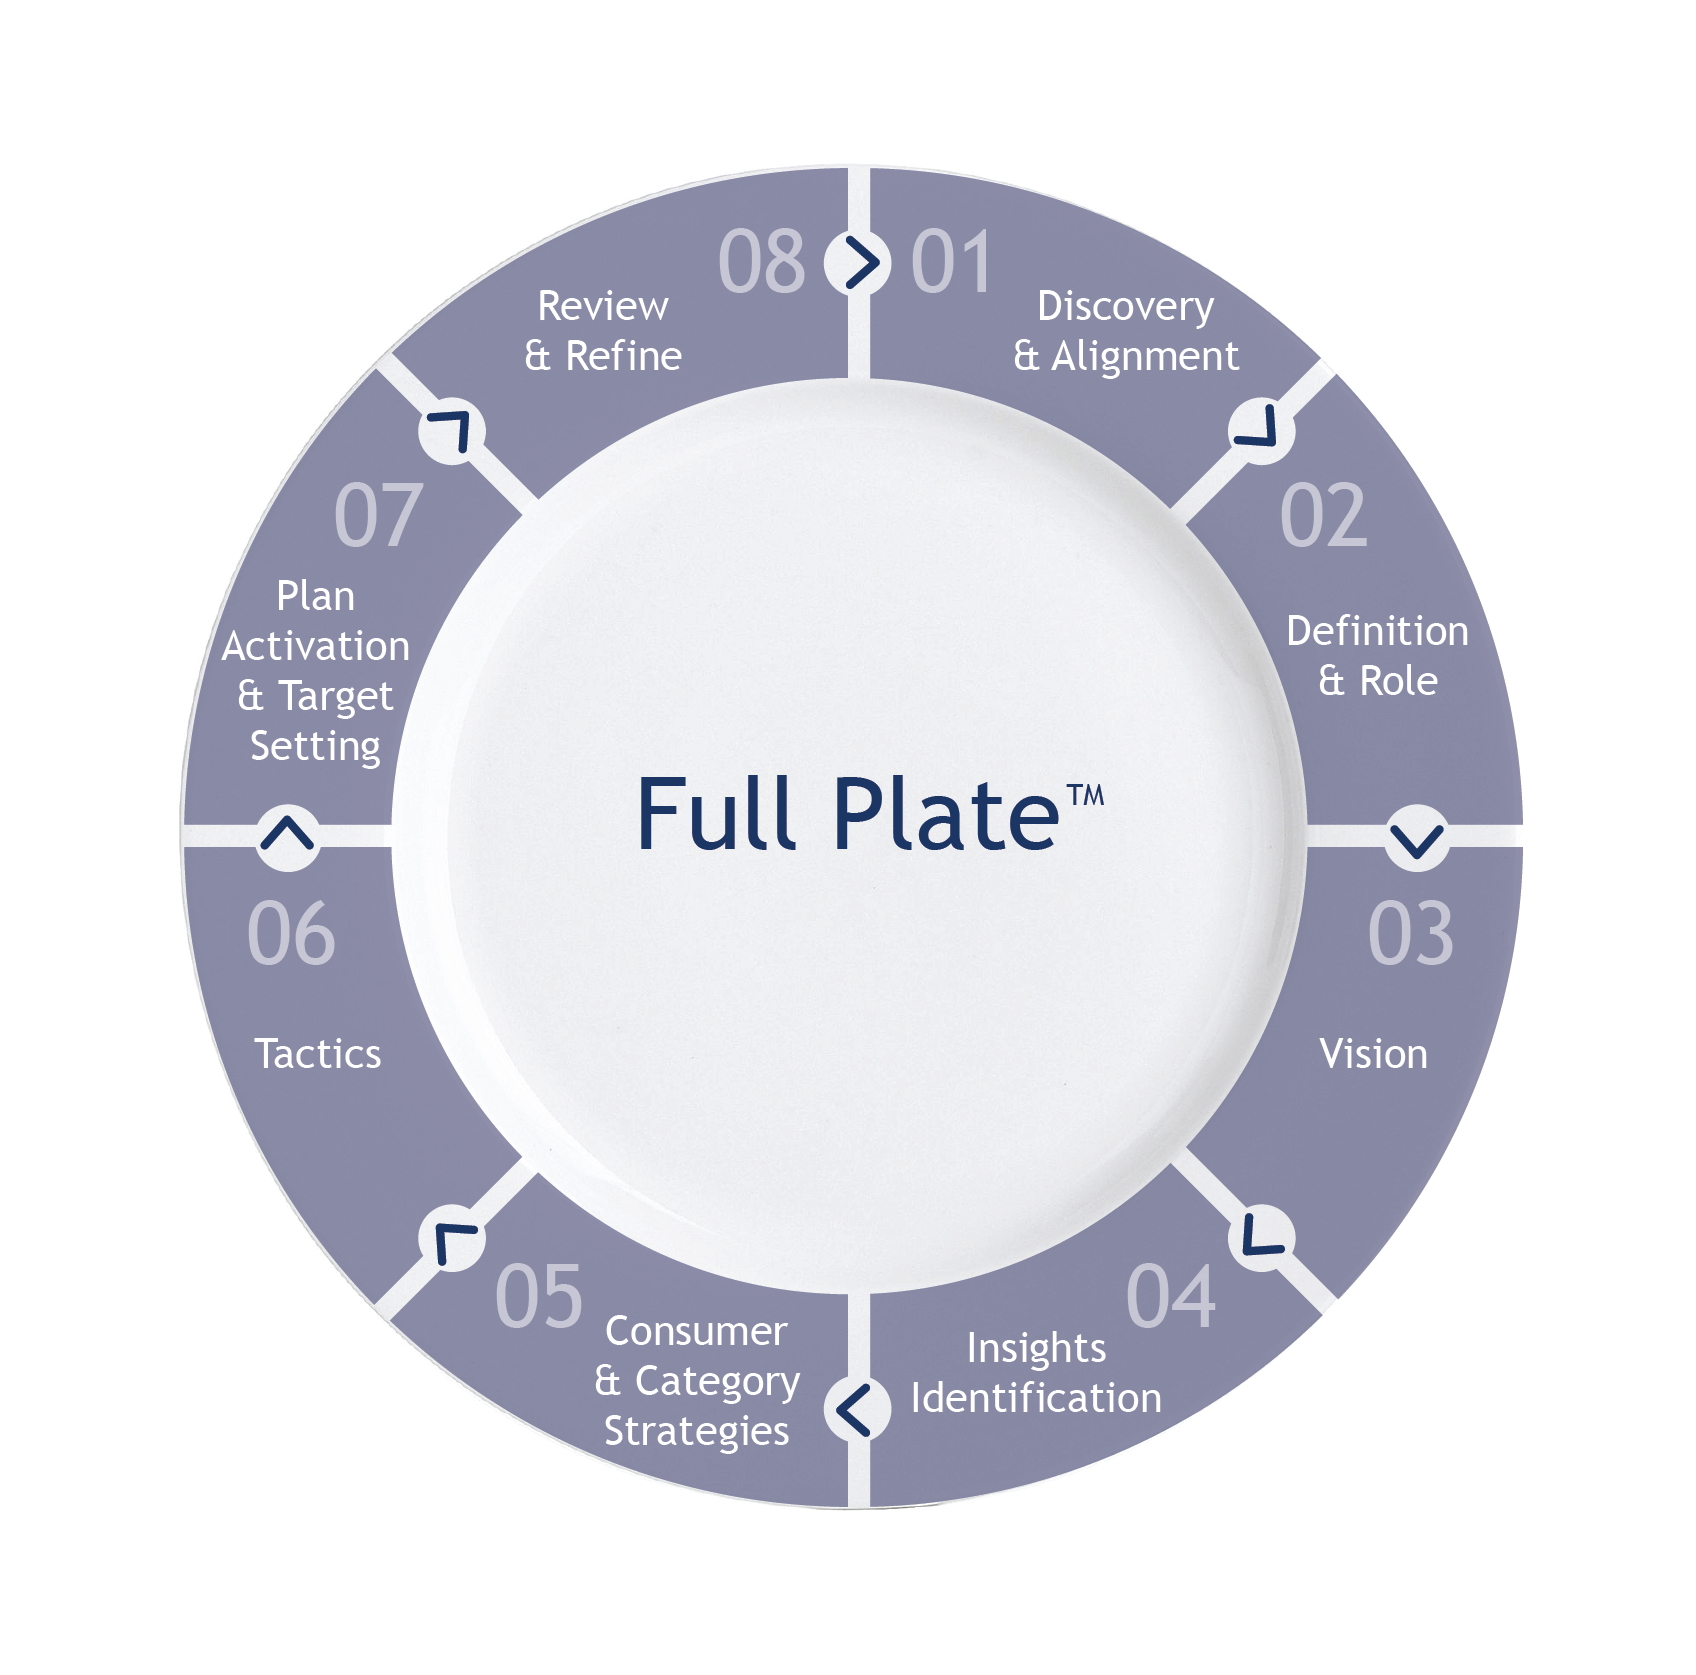 Marketing Plan Segmentation Criteria